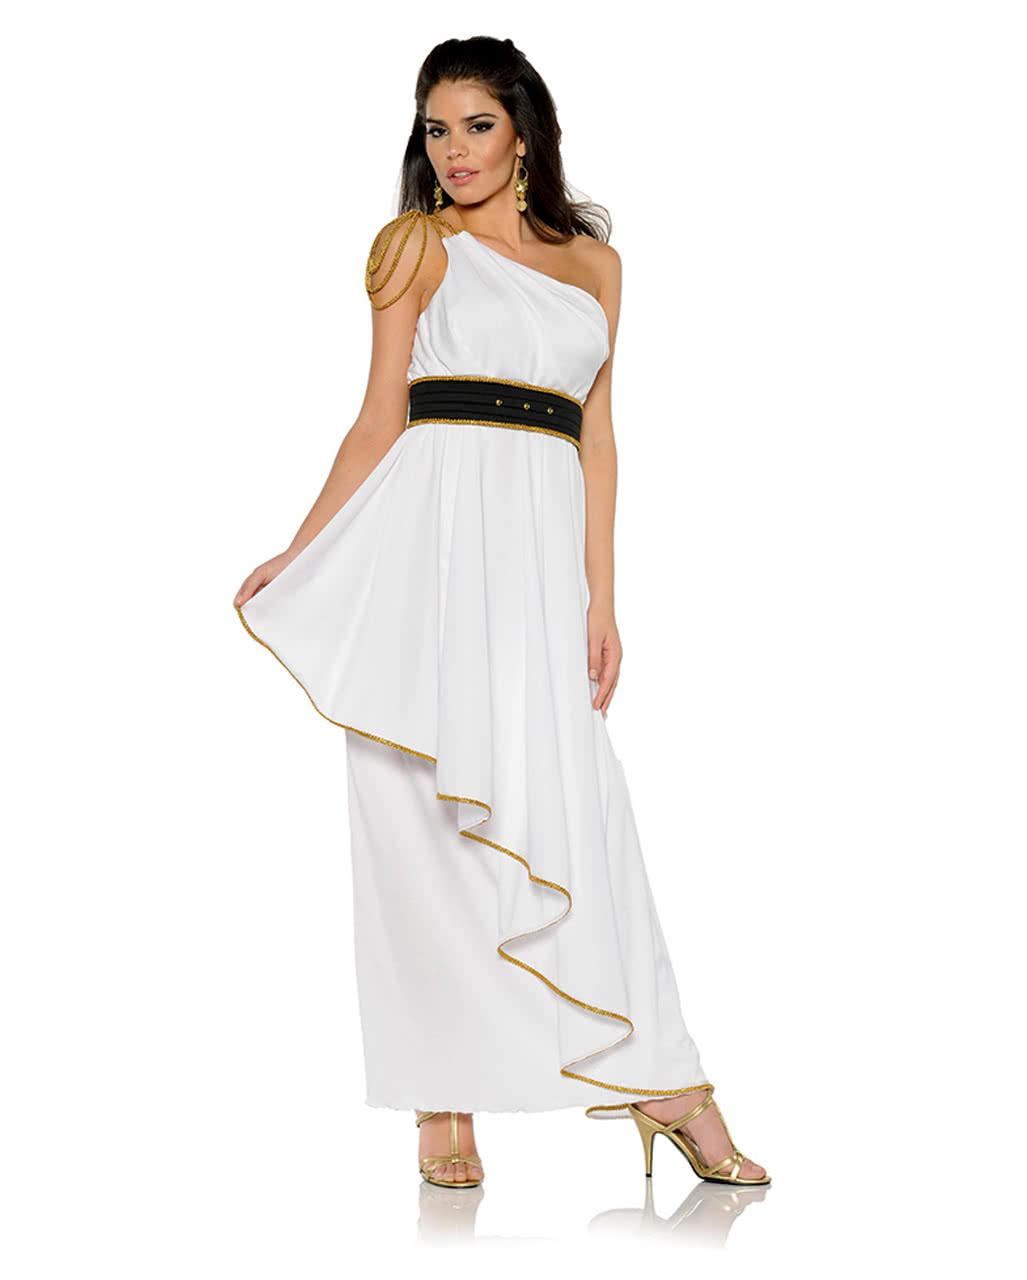 Athena costume romans greeks buy costumes horror shop solutioingenieria Choice Image